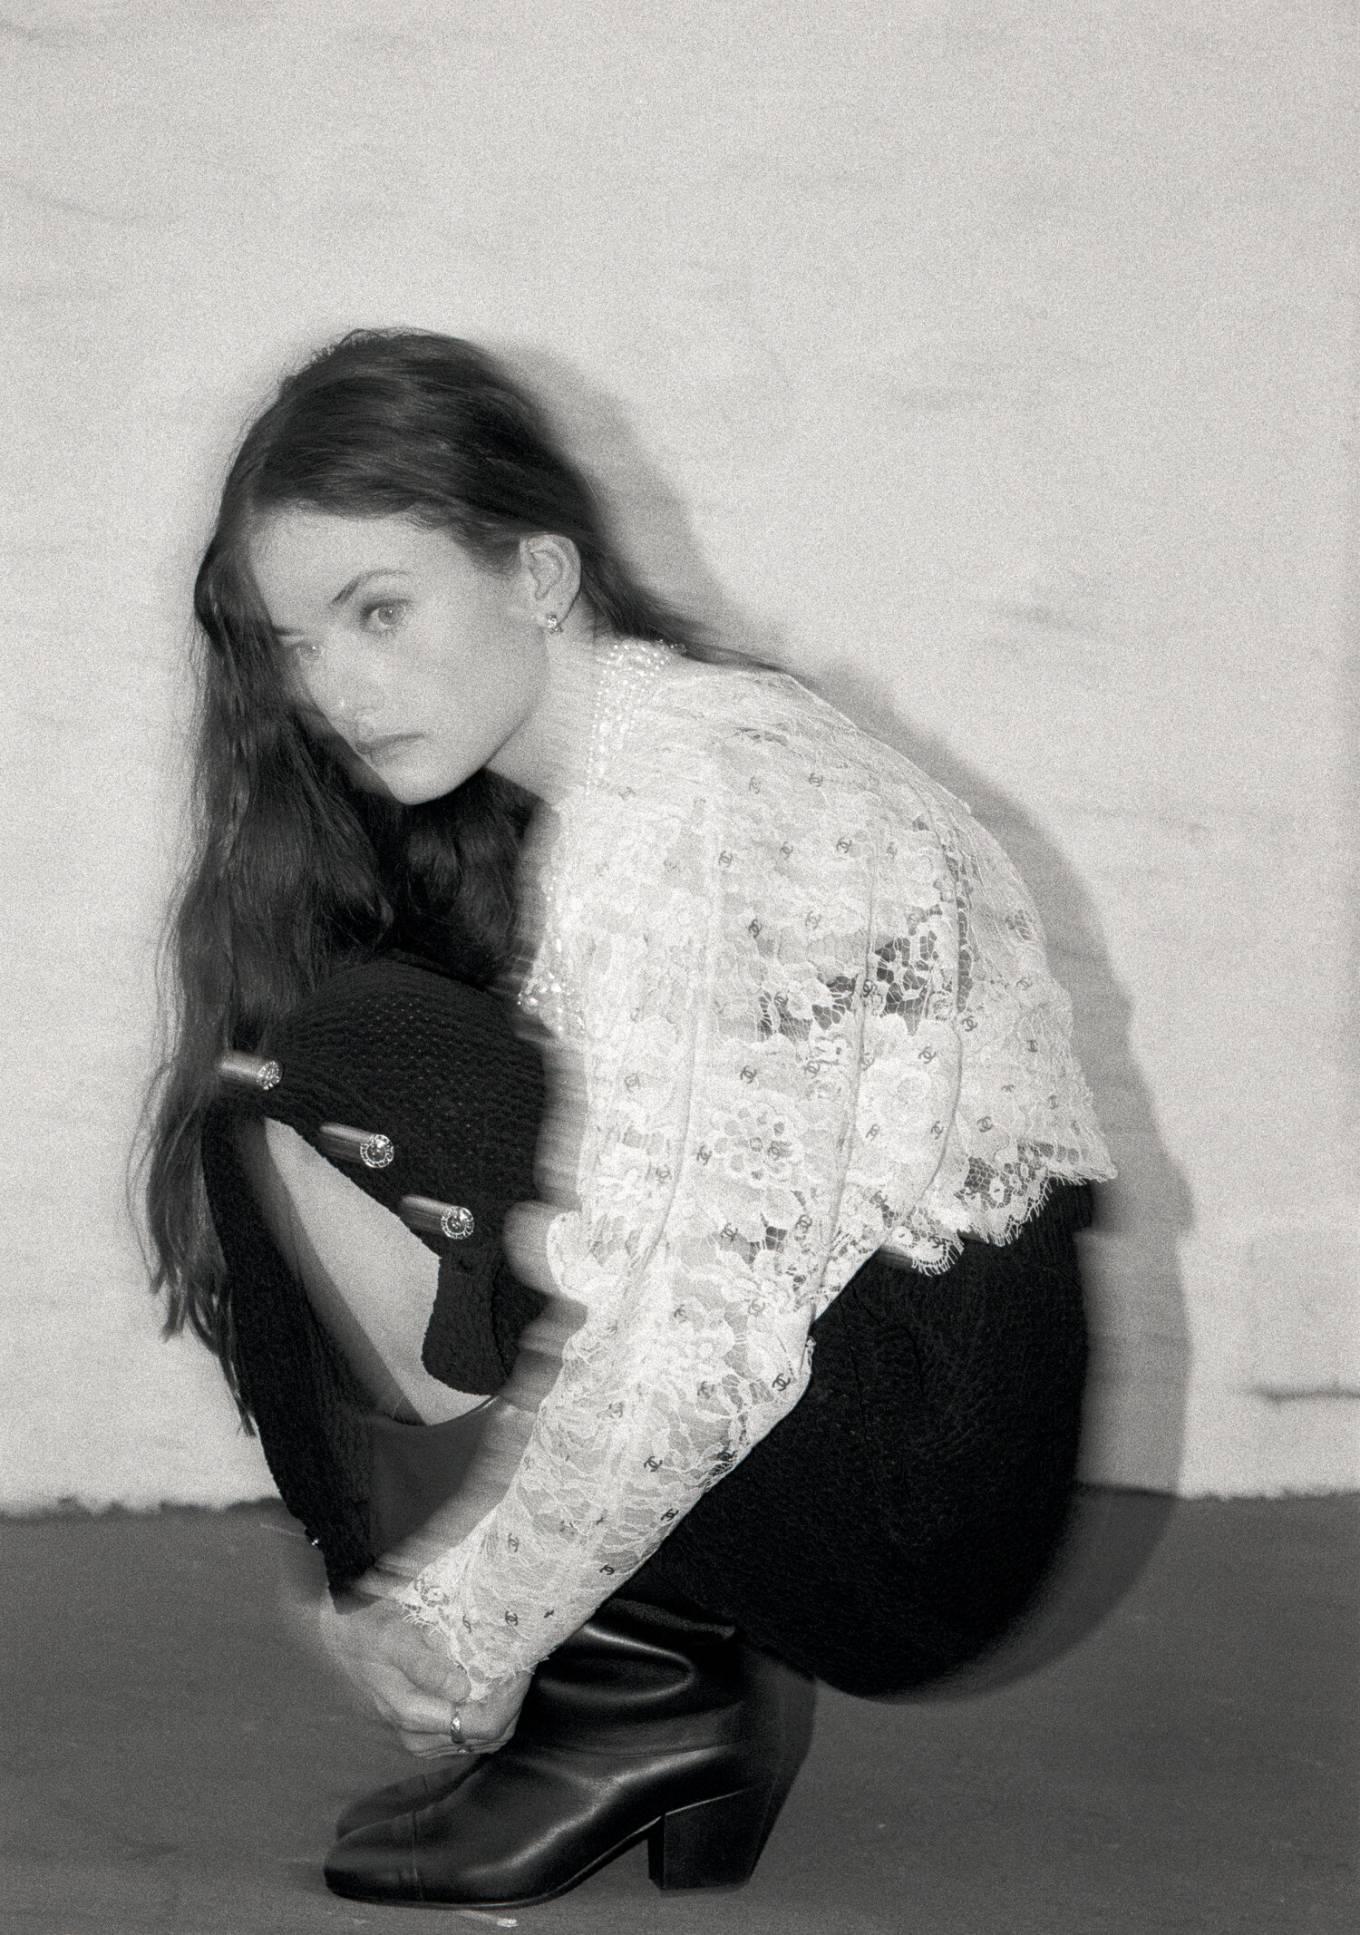 Mackenzie Foy 2020 : Mackenzie Foy – Wearing Chanel in photoshoot for Flaunt Magazine-06